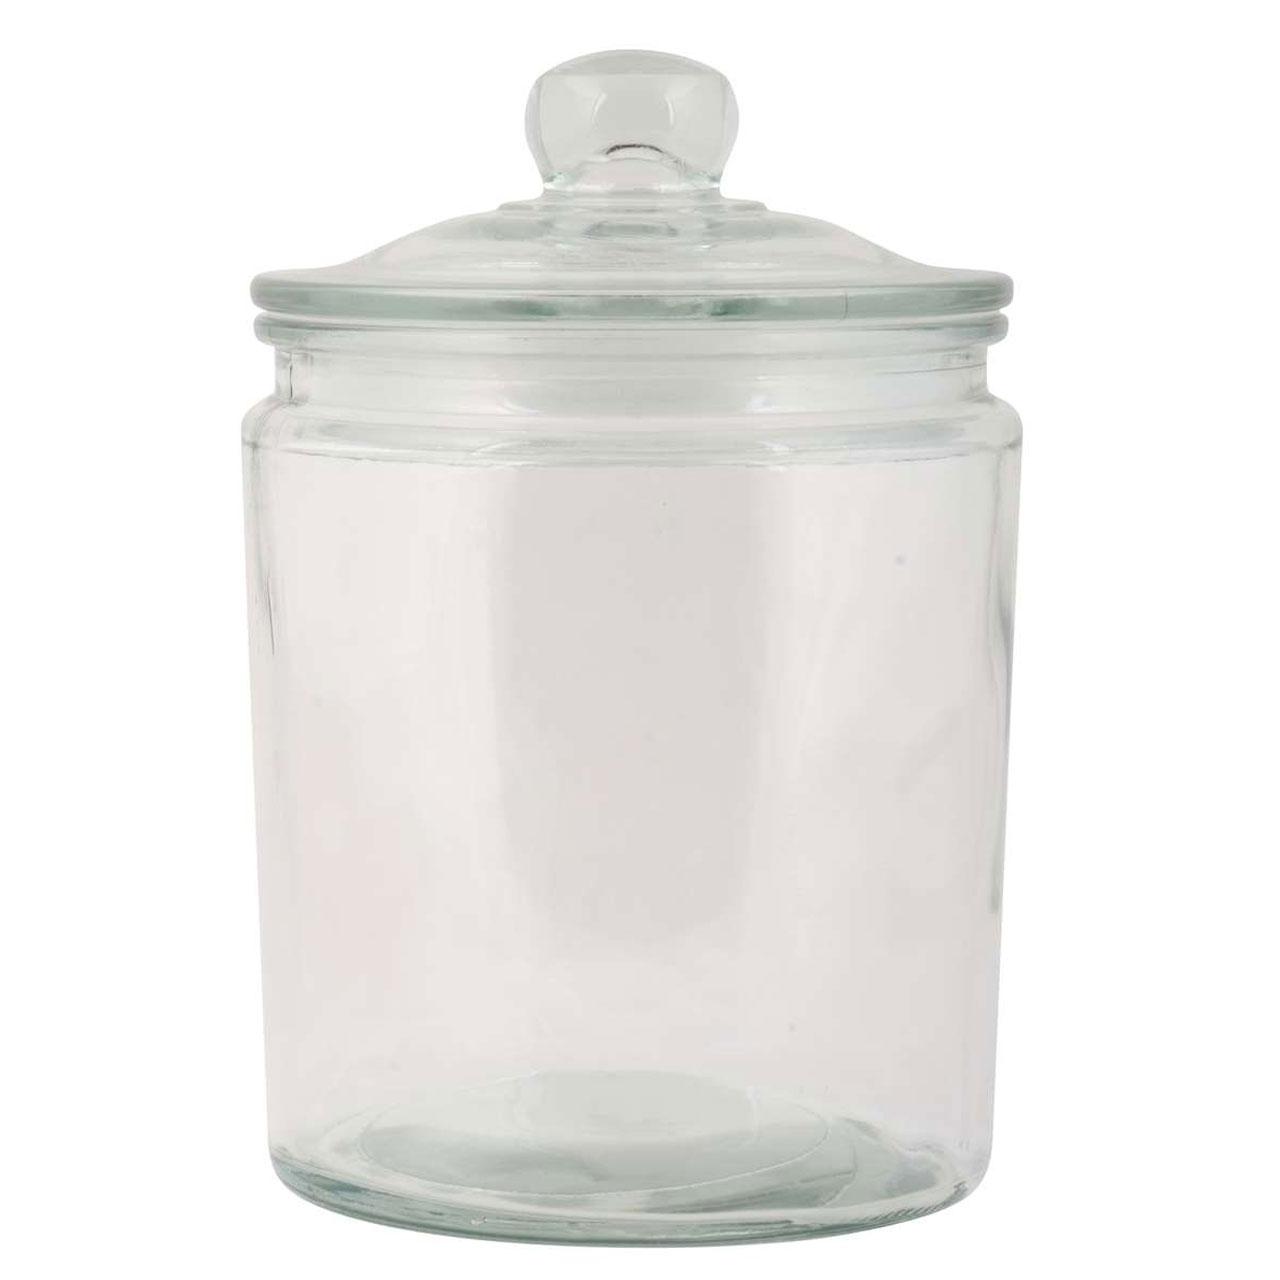 Vorratsdose Glas mit Deckel